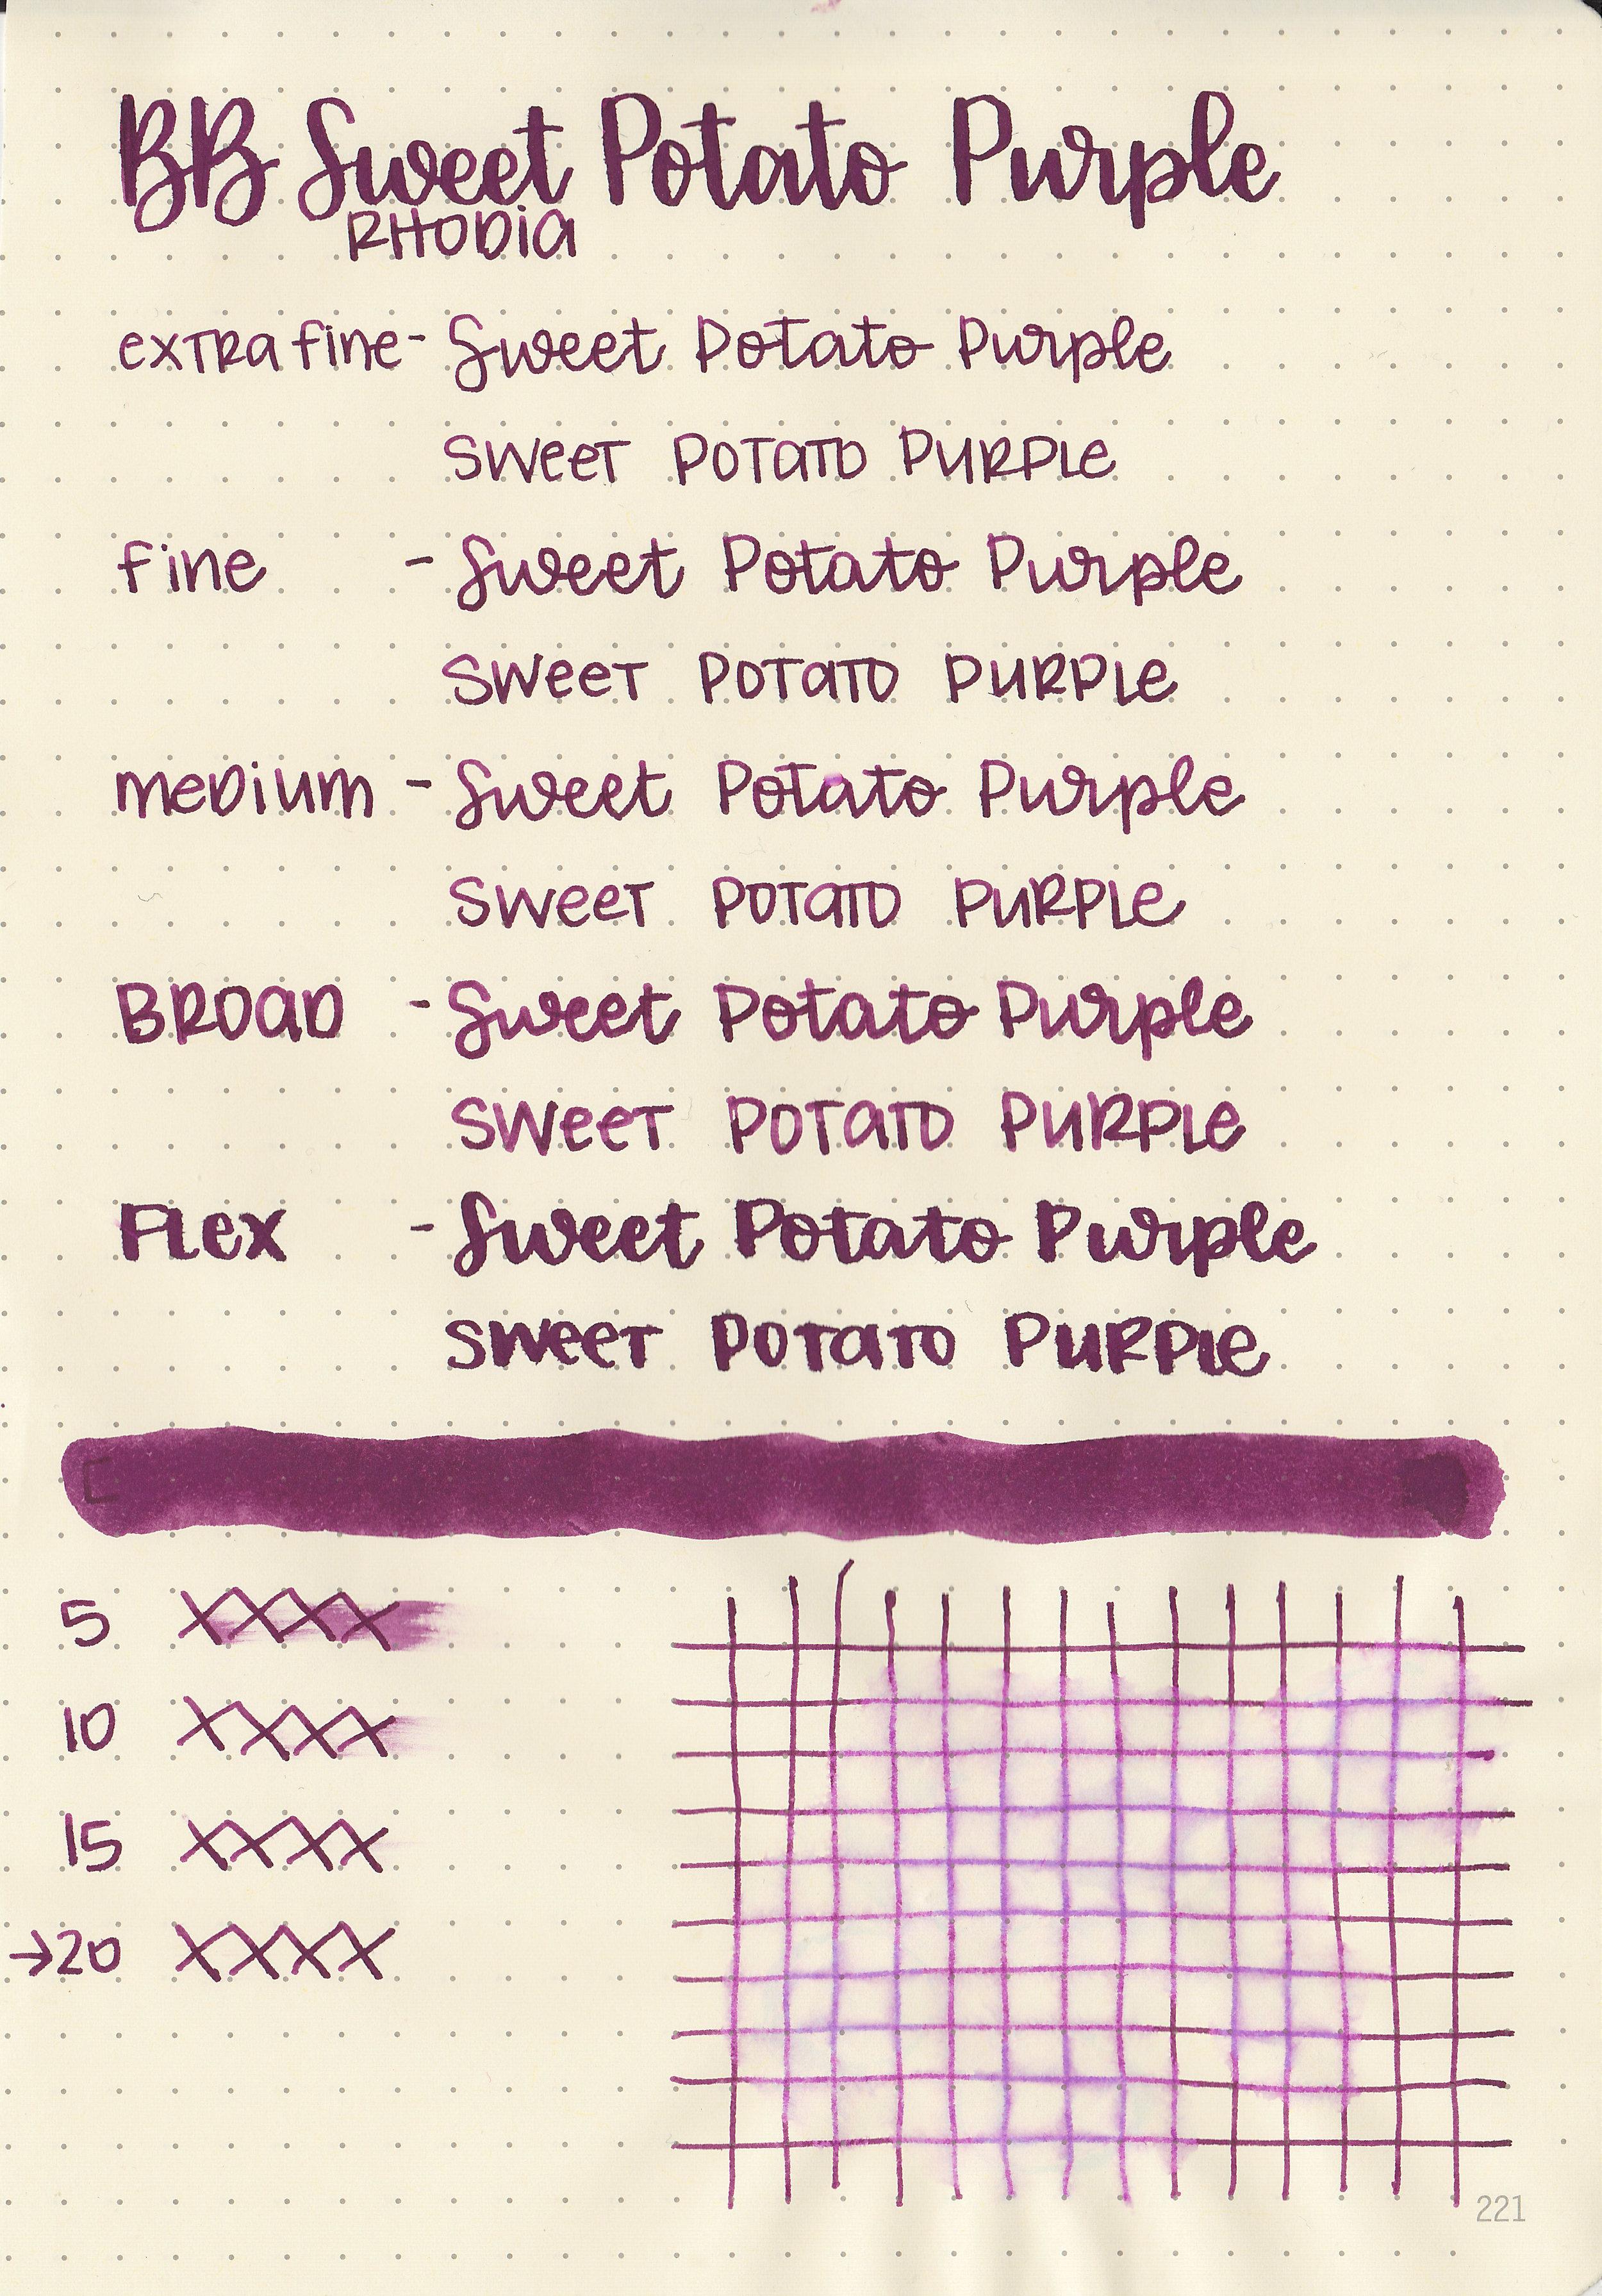 bb-sweet-potato-purple-7.jpg